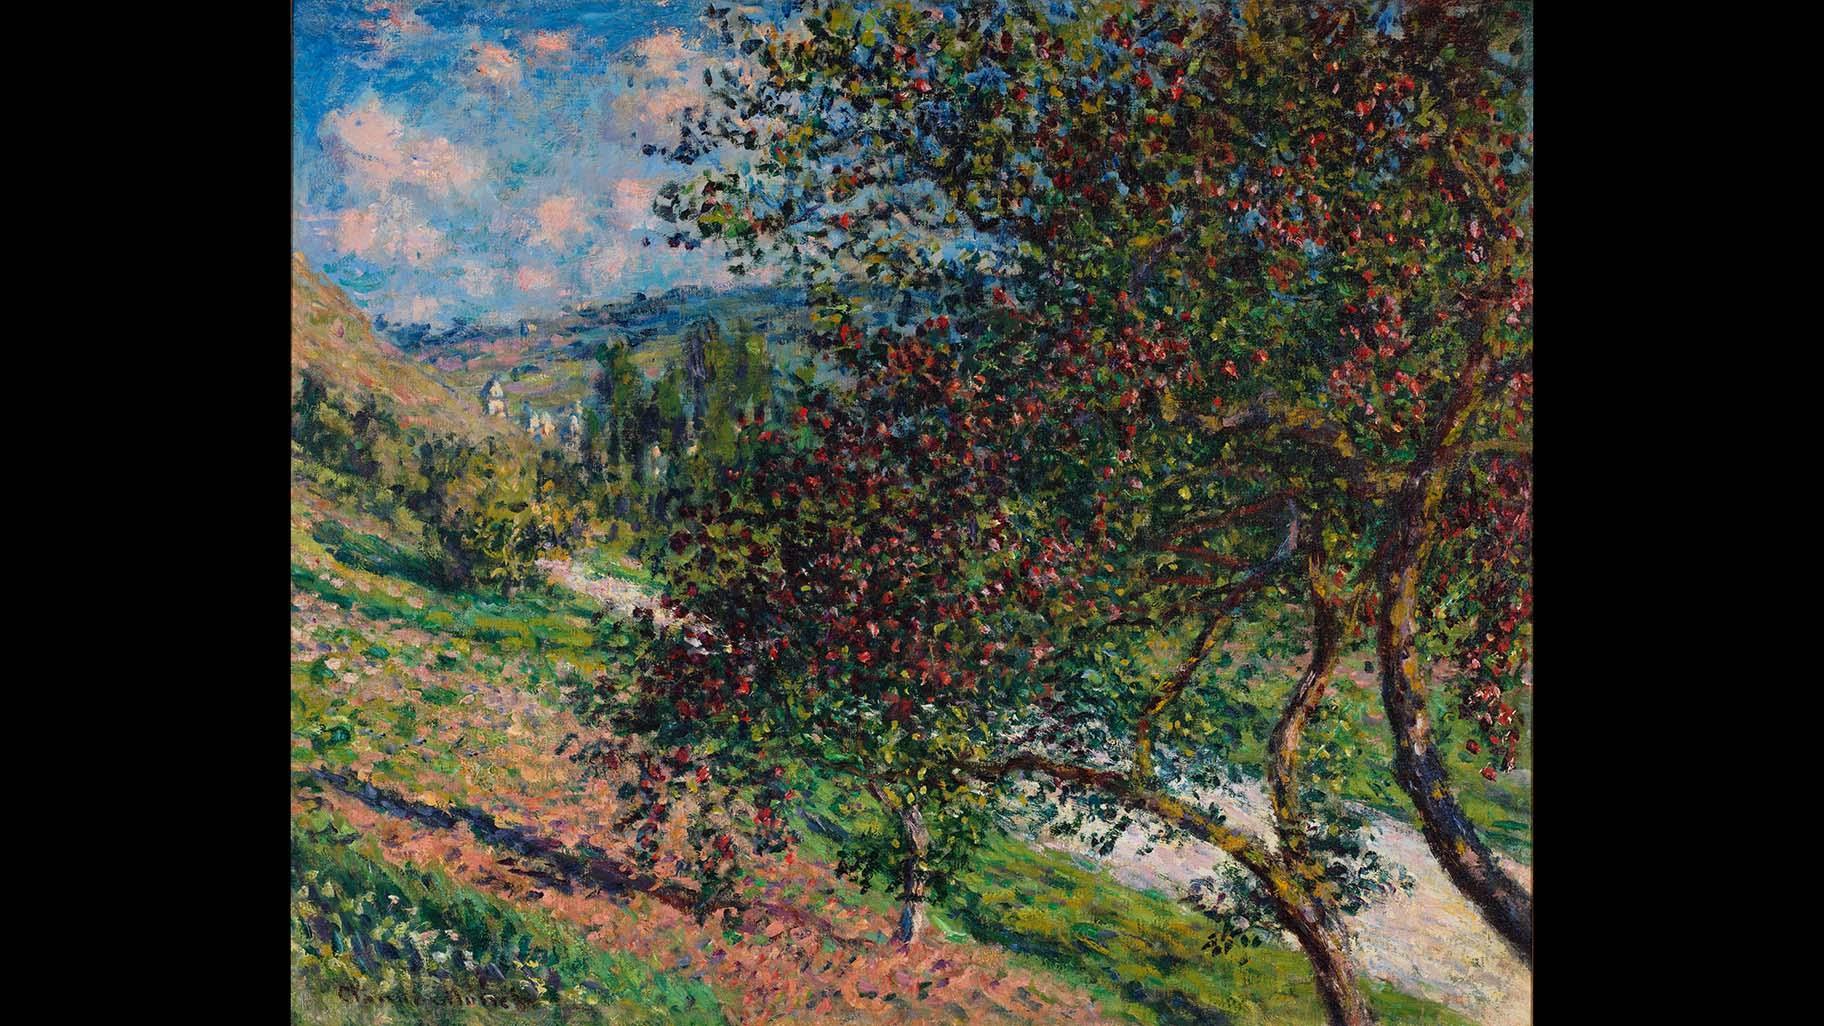 Claude Monet. Apple Trees, Vétheuil, 1878. Private collection. Photo by Jamie Stukenberg, Professional Graphics Inc.